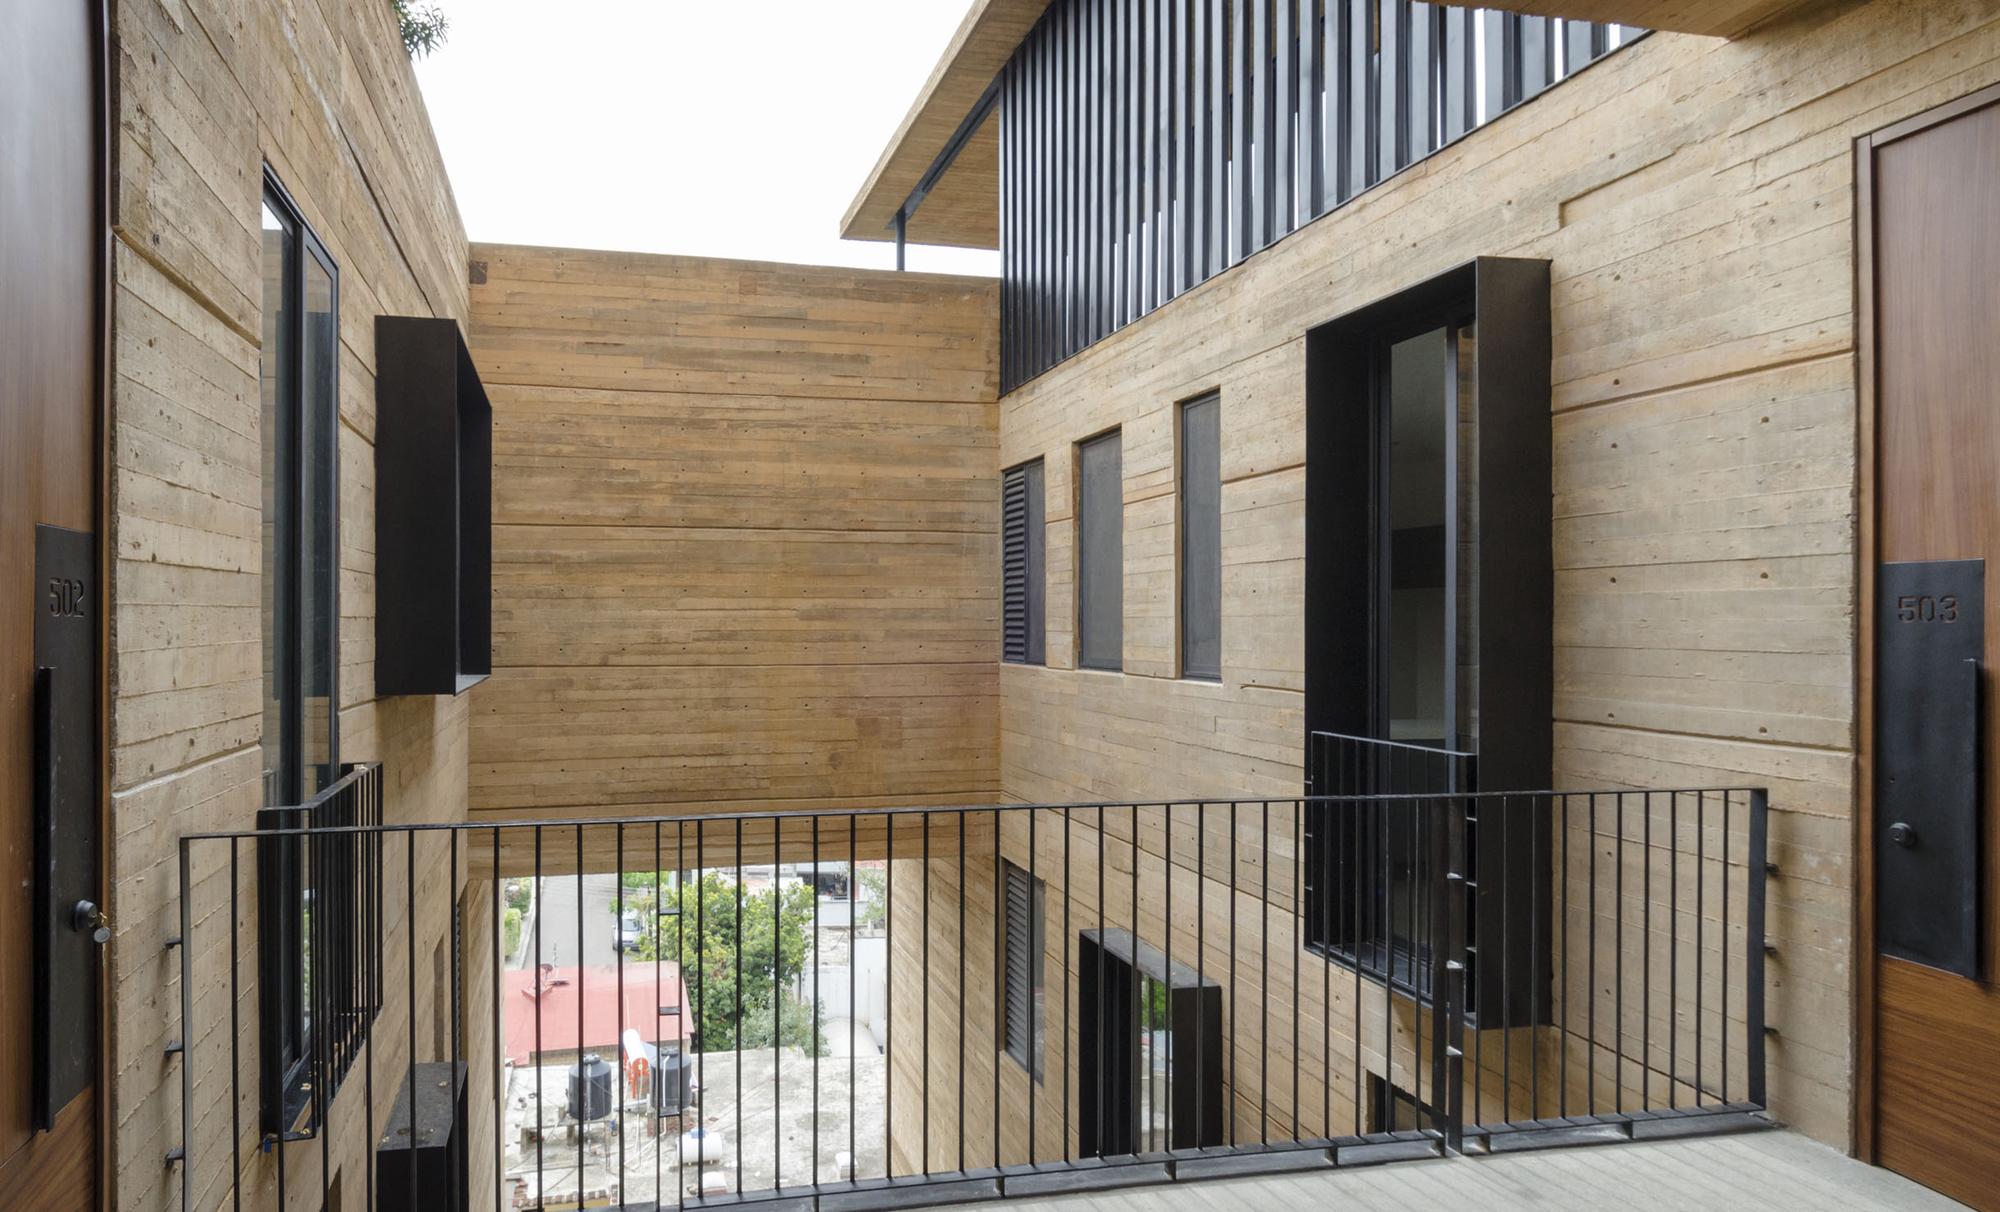 Edificio Vista San Felipe / Daniel López Salgado & Asociados - Plataforma Arquitectura